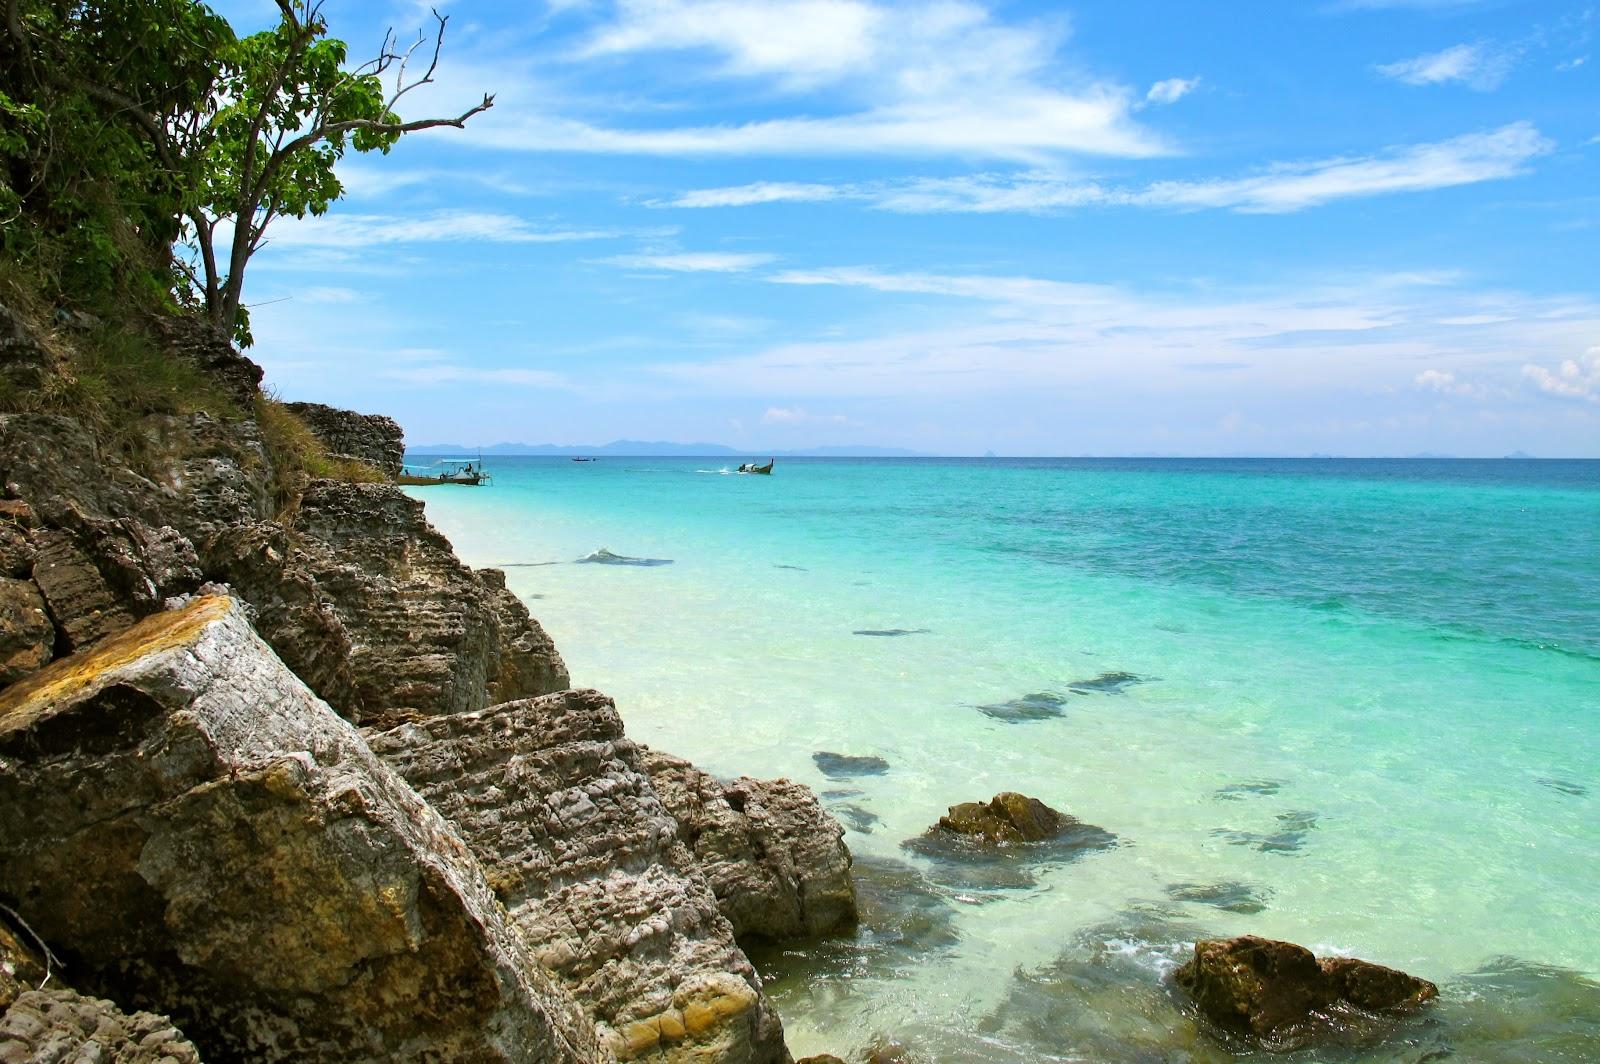 Phi Phi Island Snorkeling Tour to Maya Bay & Bamboo Island from Lanta